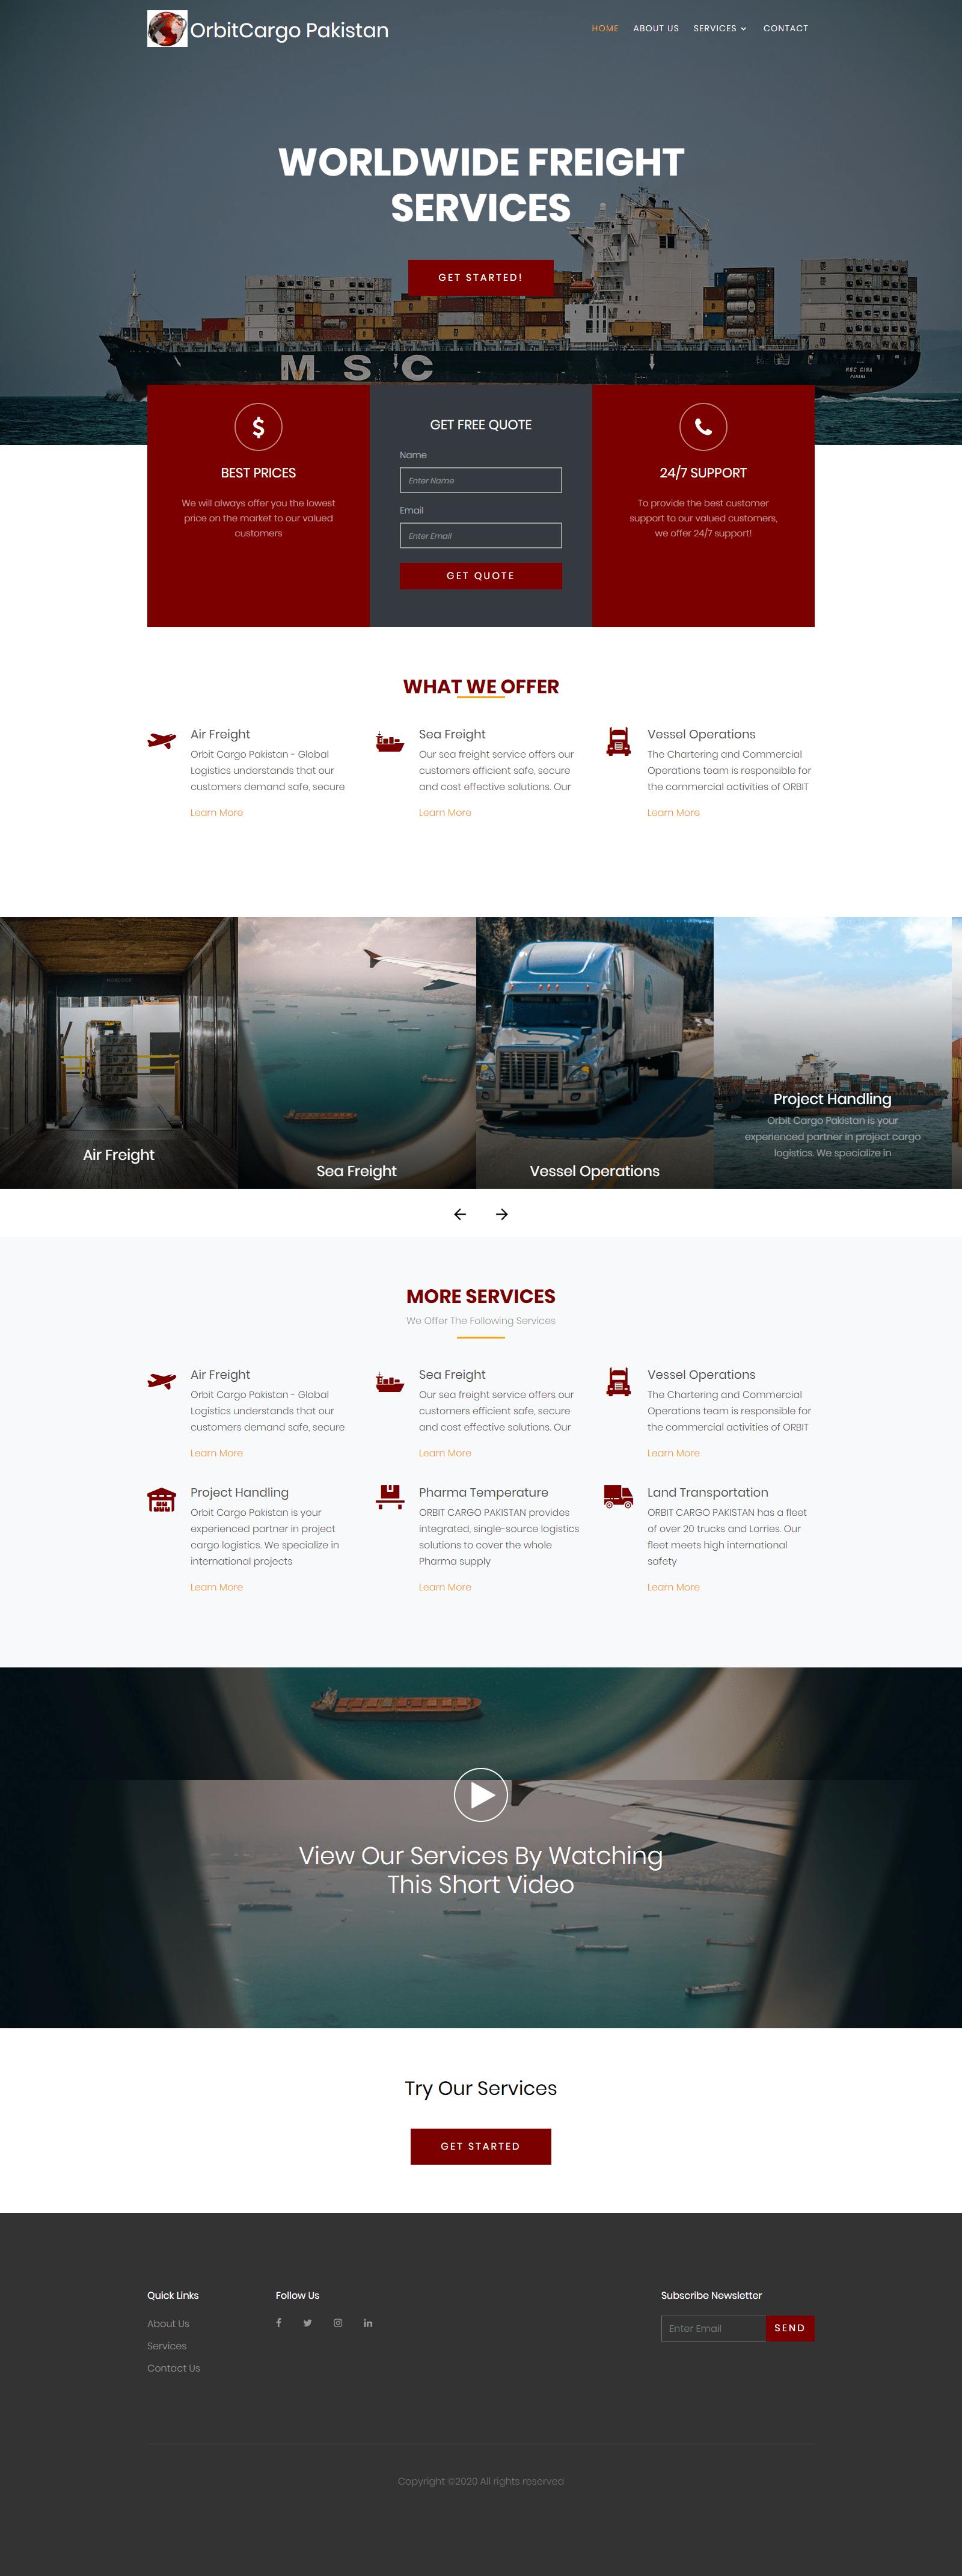 designing a web